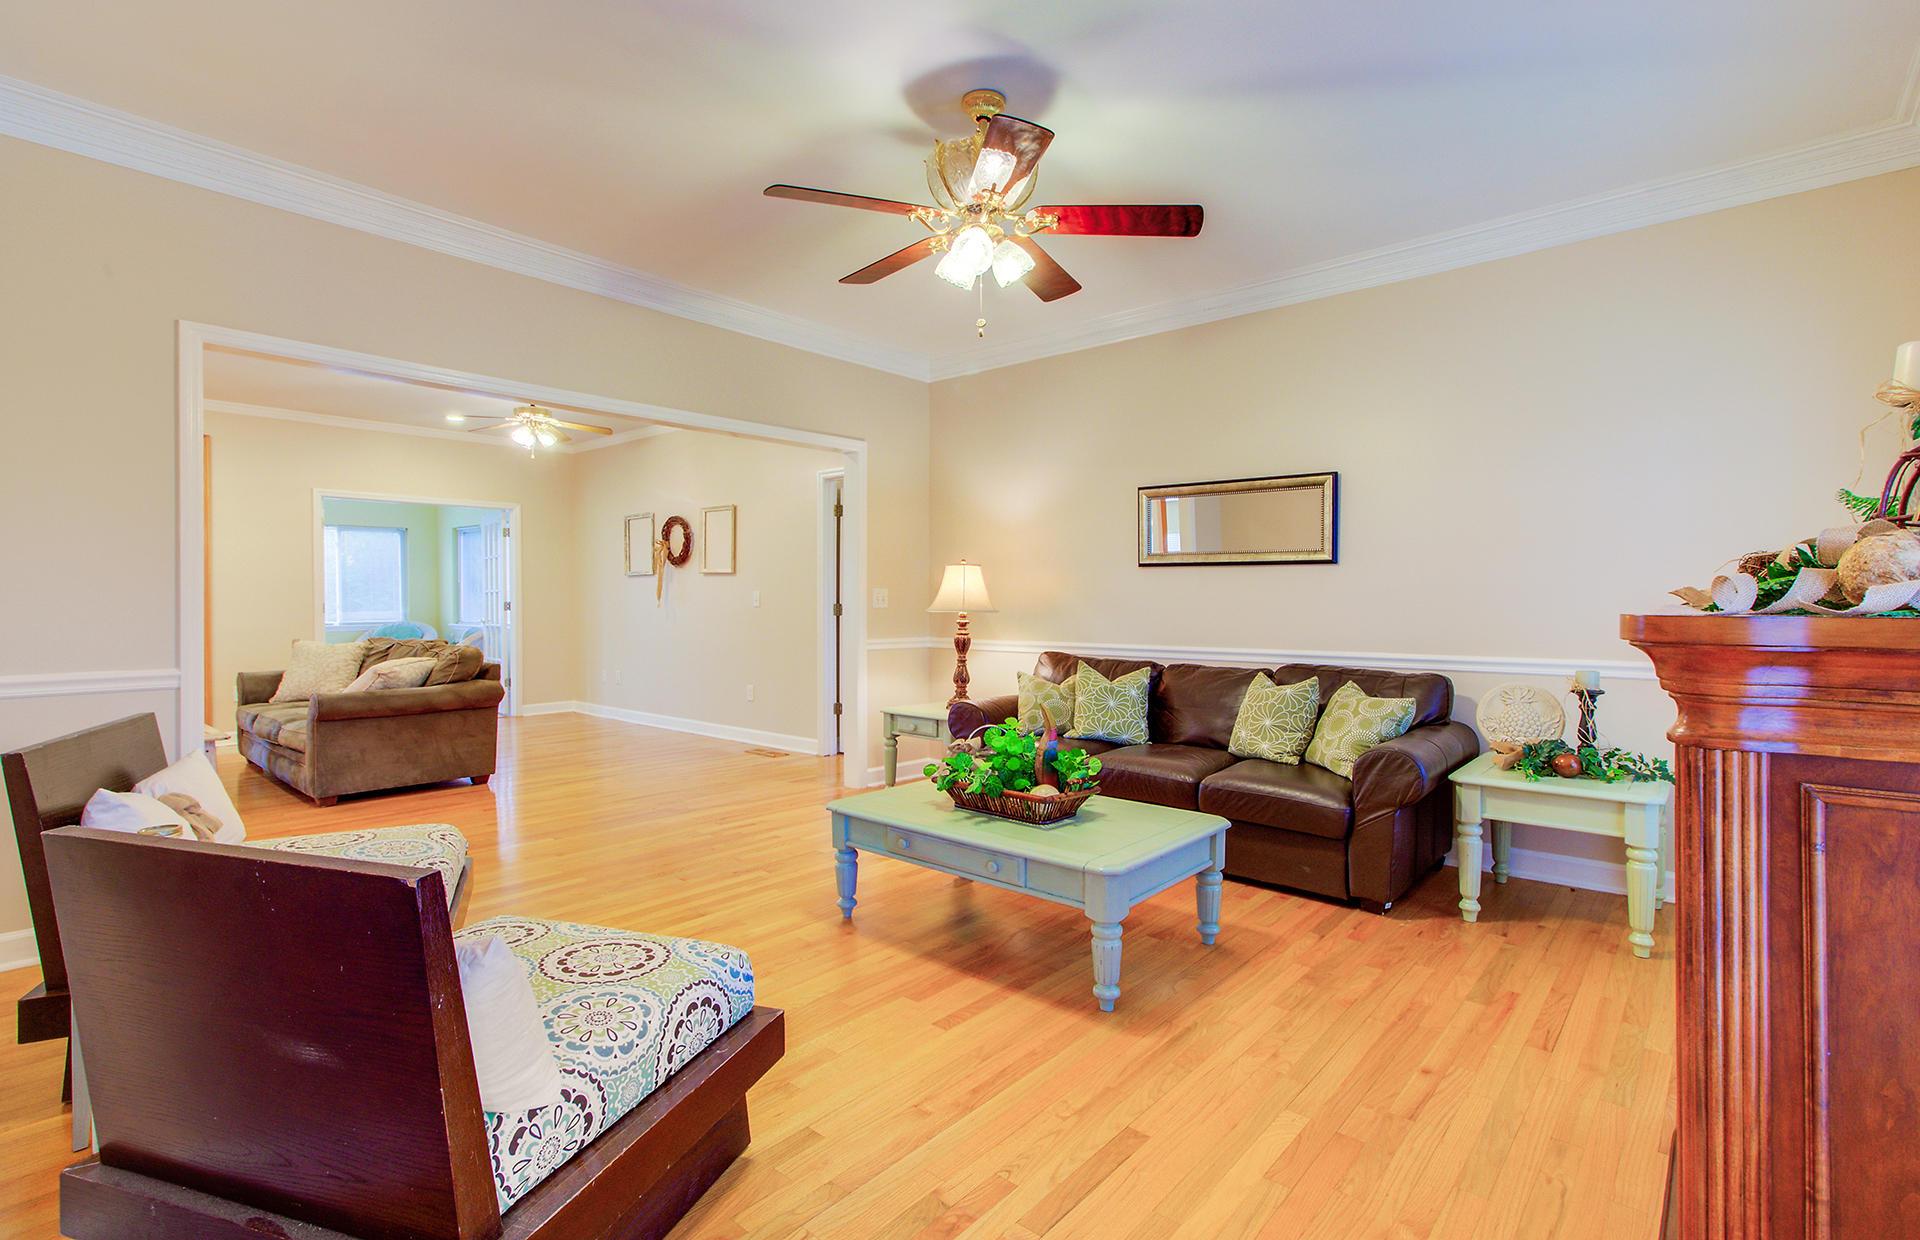 Bakers Landing Homes For Sale - 105 River Oak, North Charleston, SC - 47